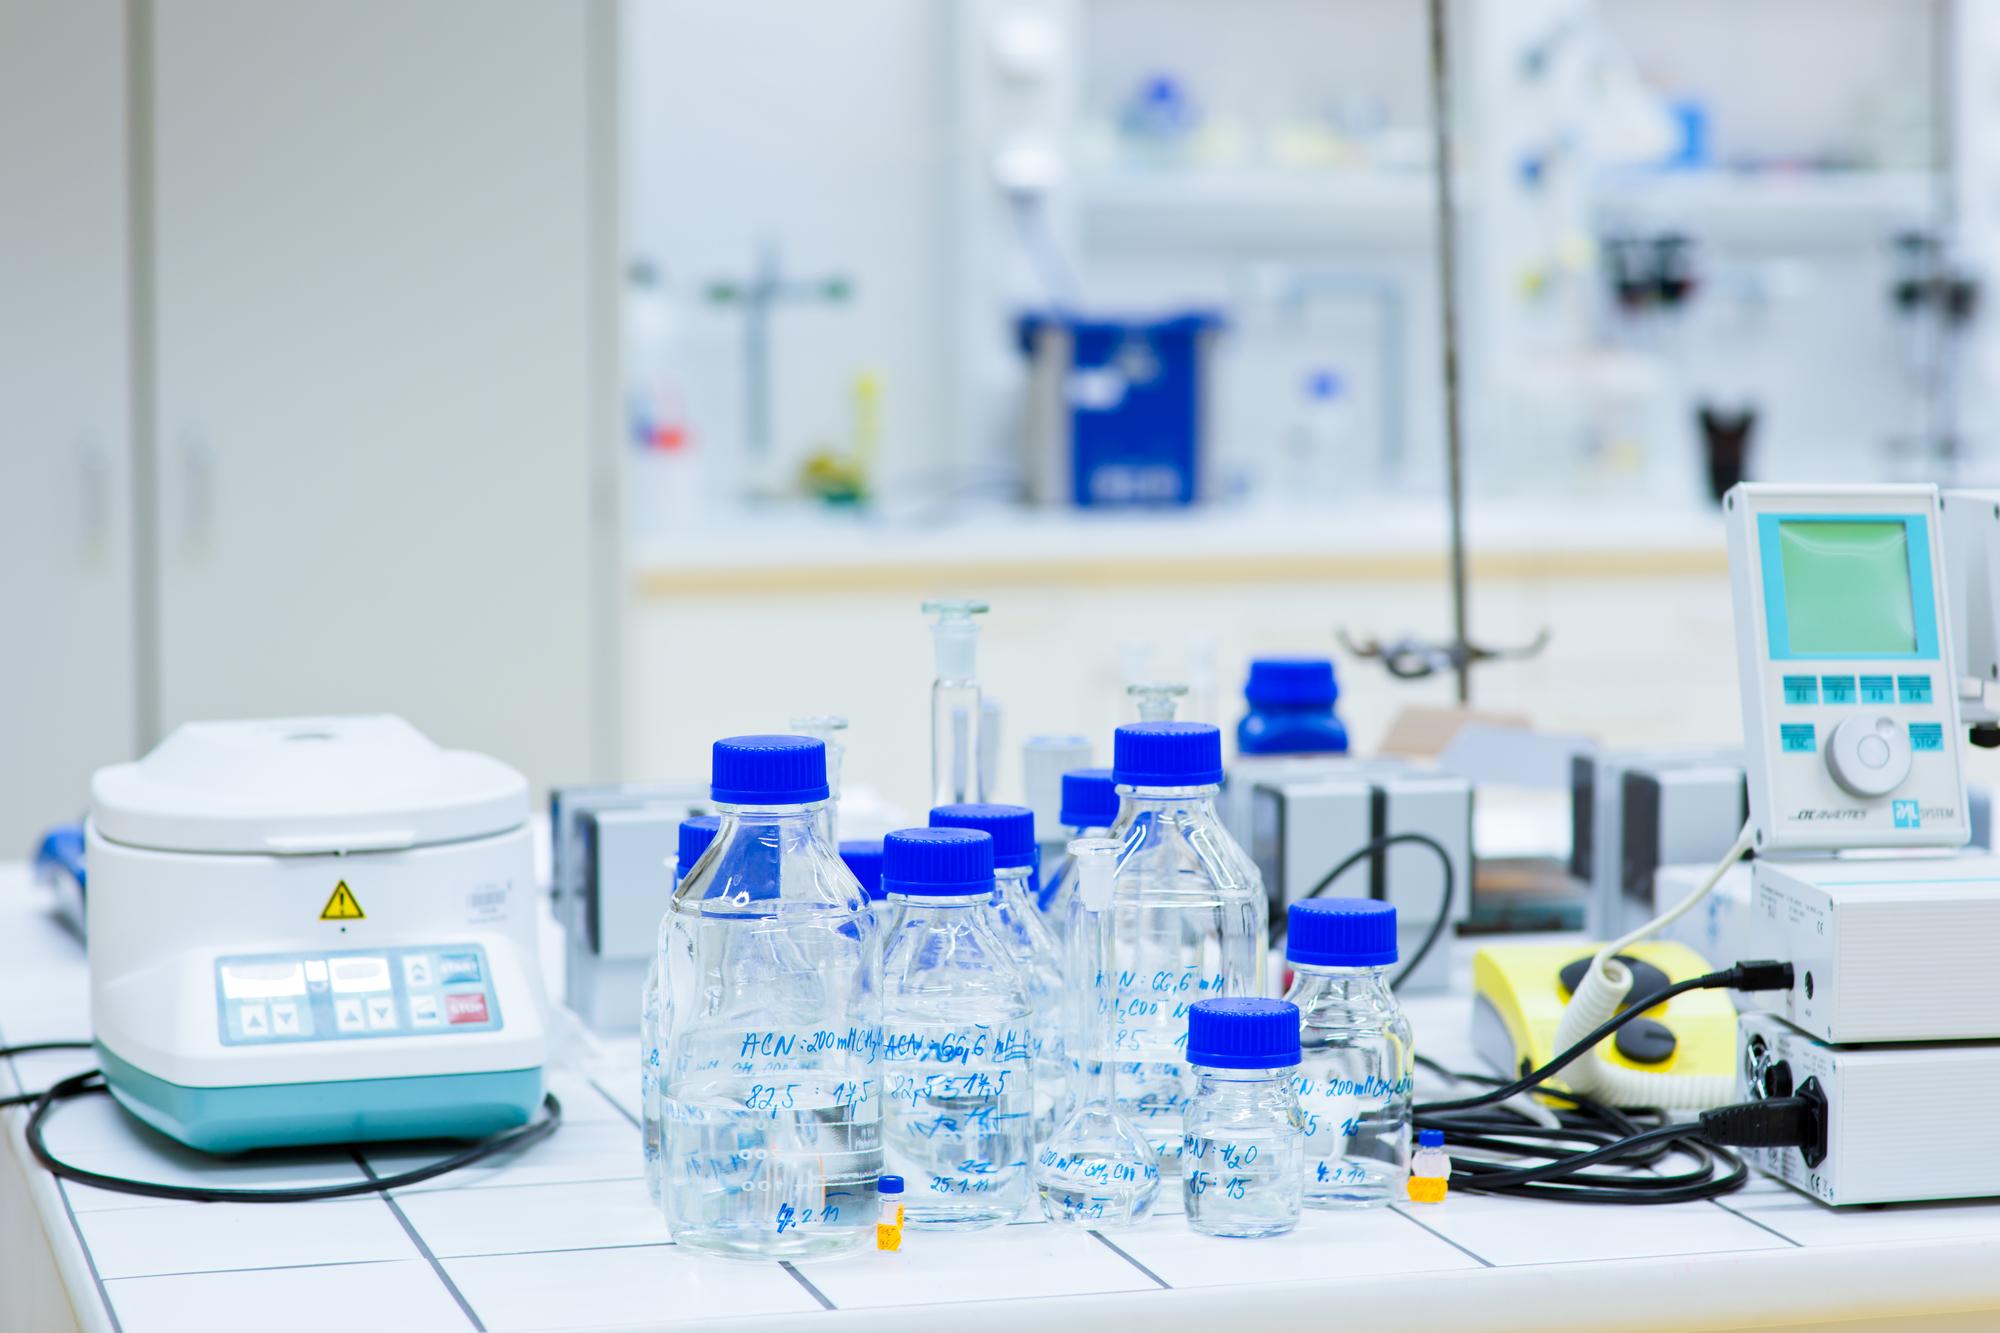 Phthalate Analysis Resources